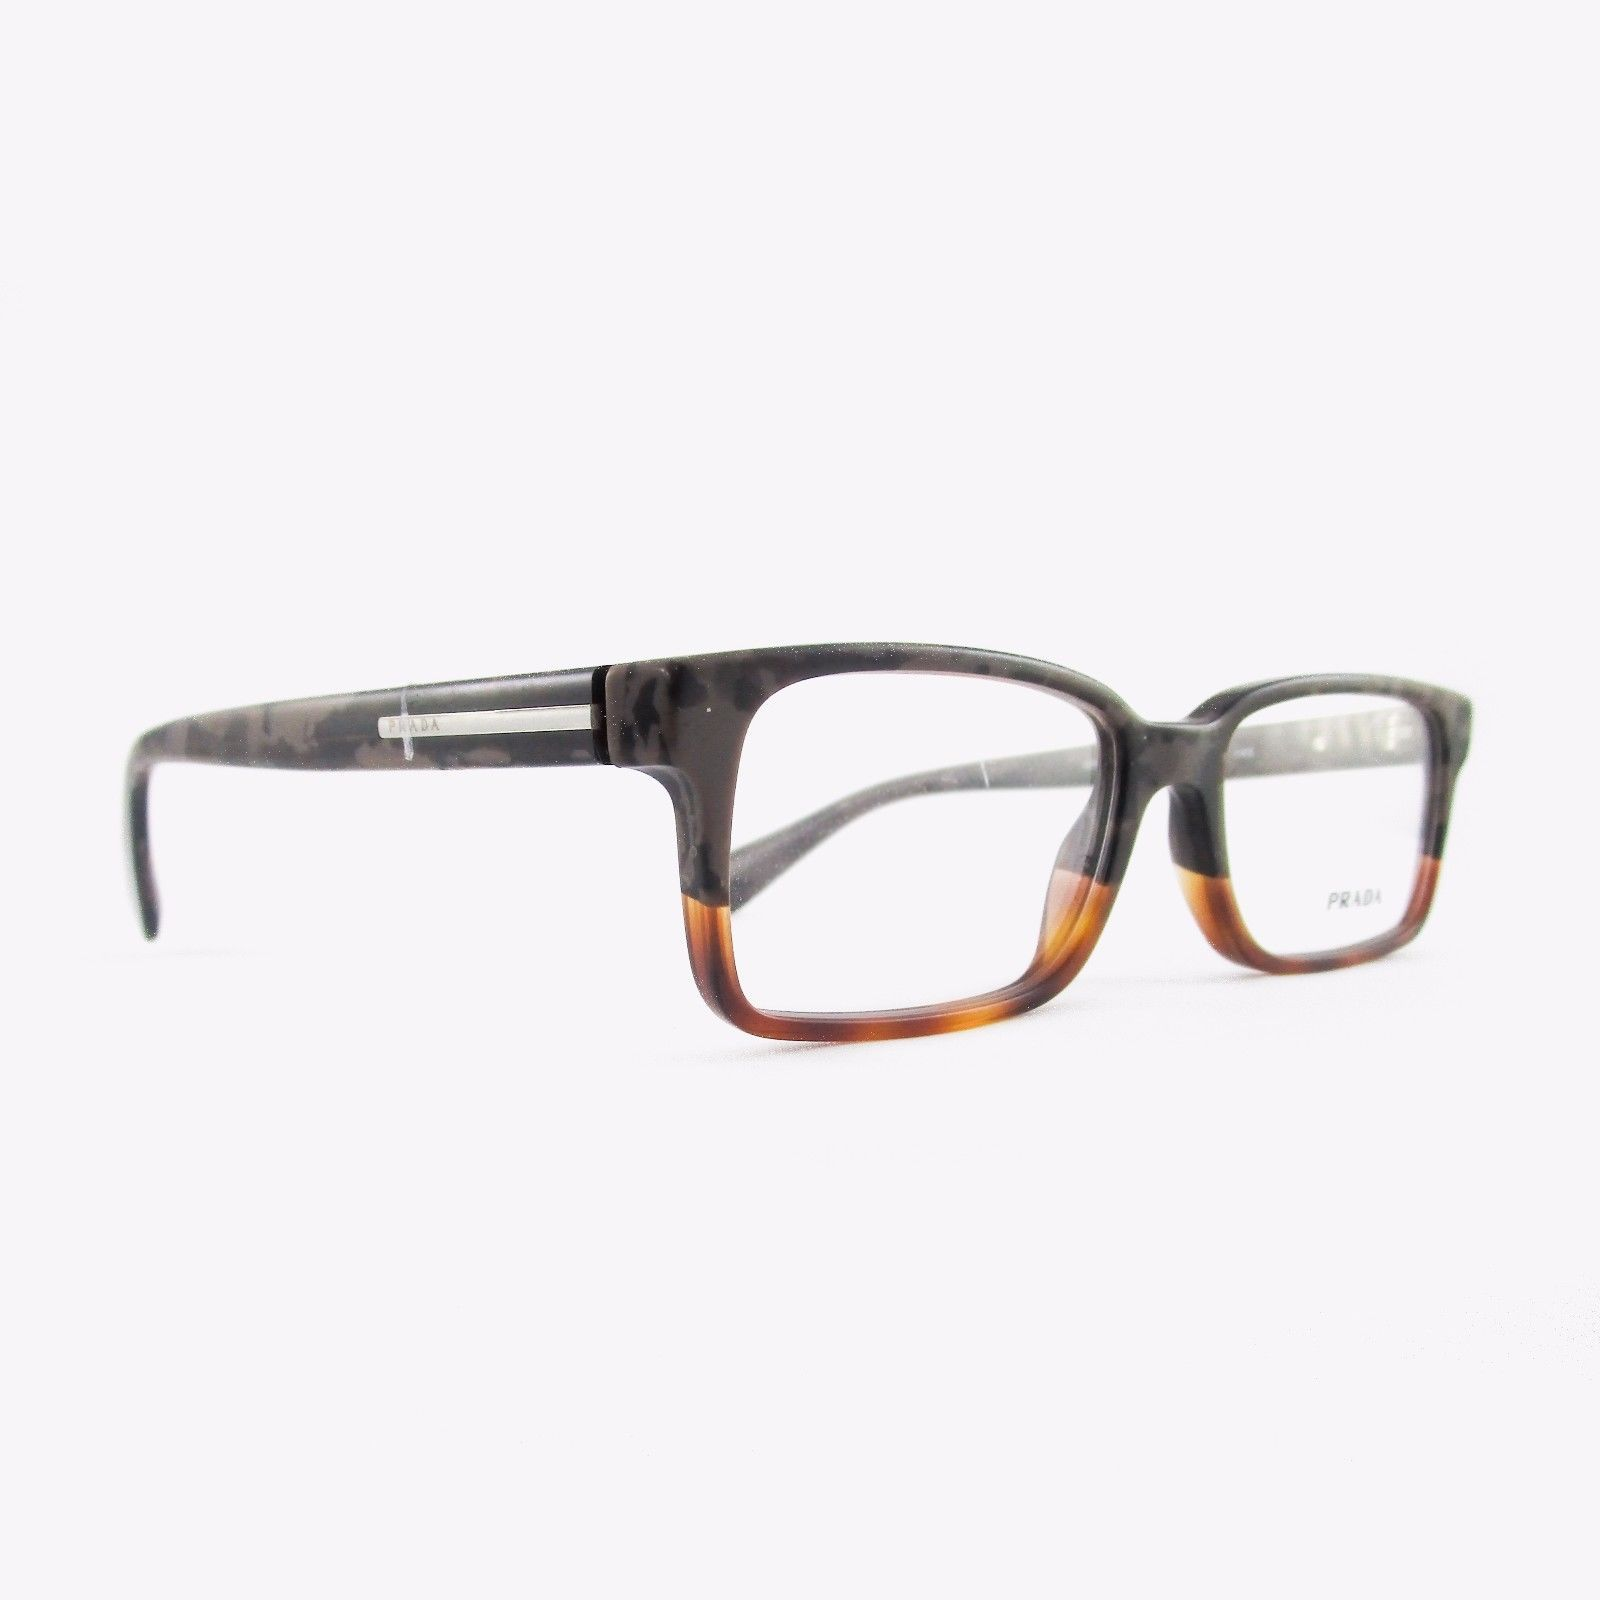 b9cbc03959aa Prada VPR15Q QE1-101 Optical Frame Havana and 31 similar items